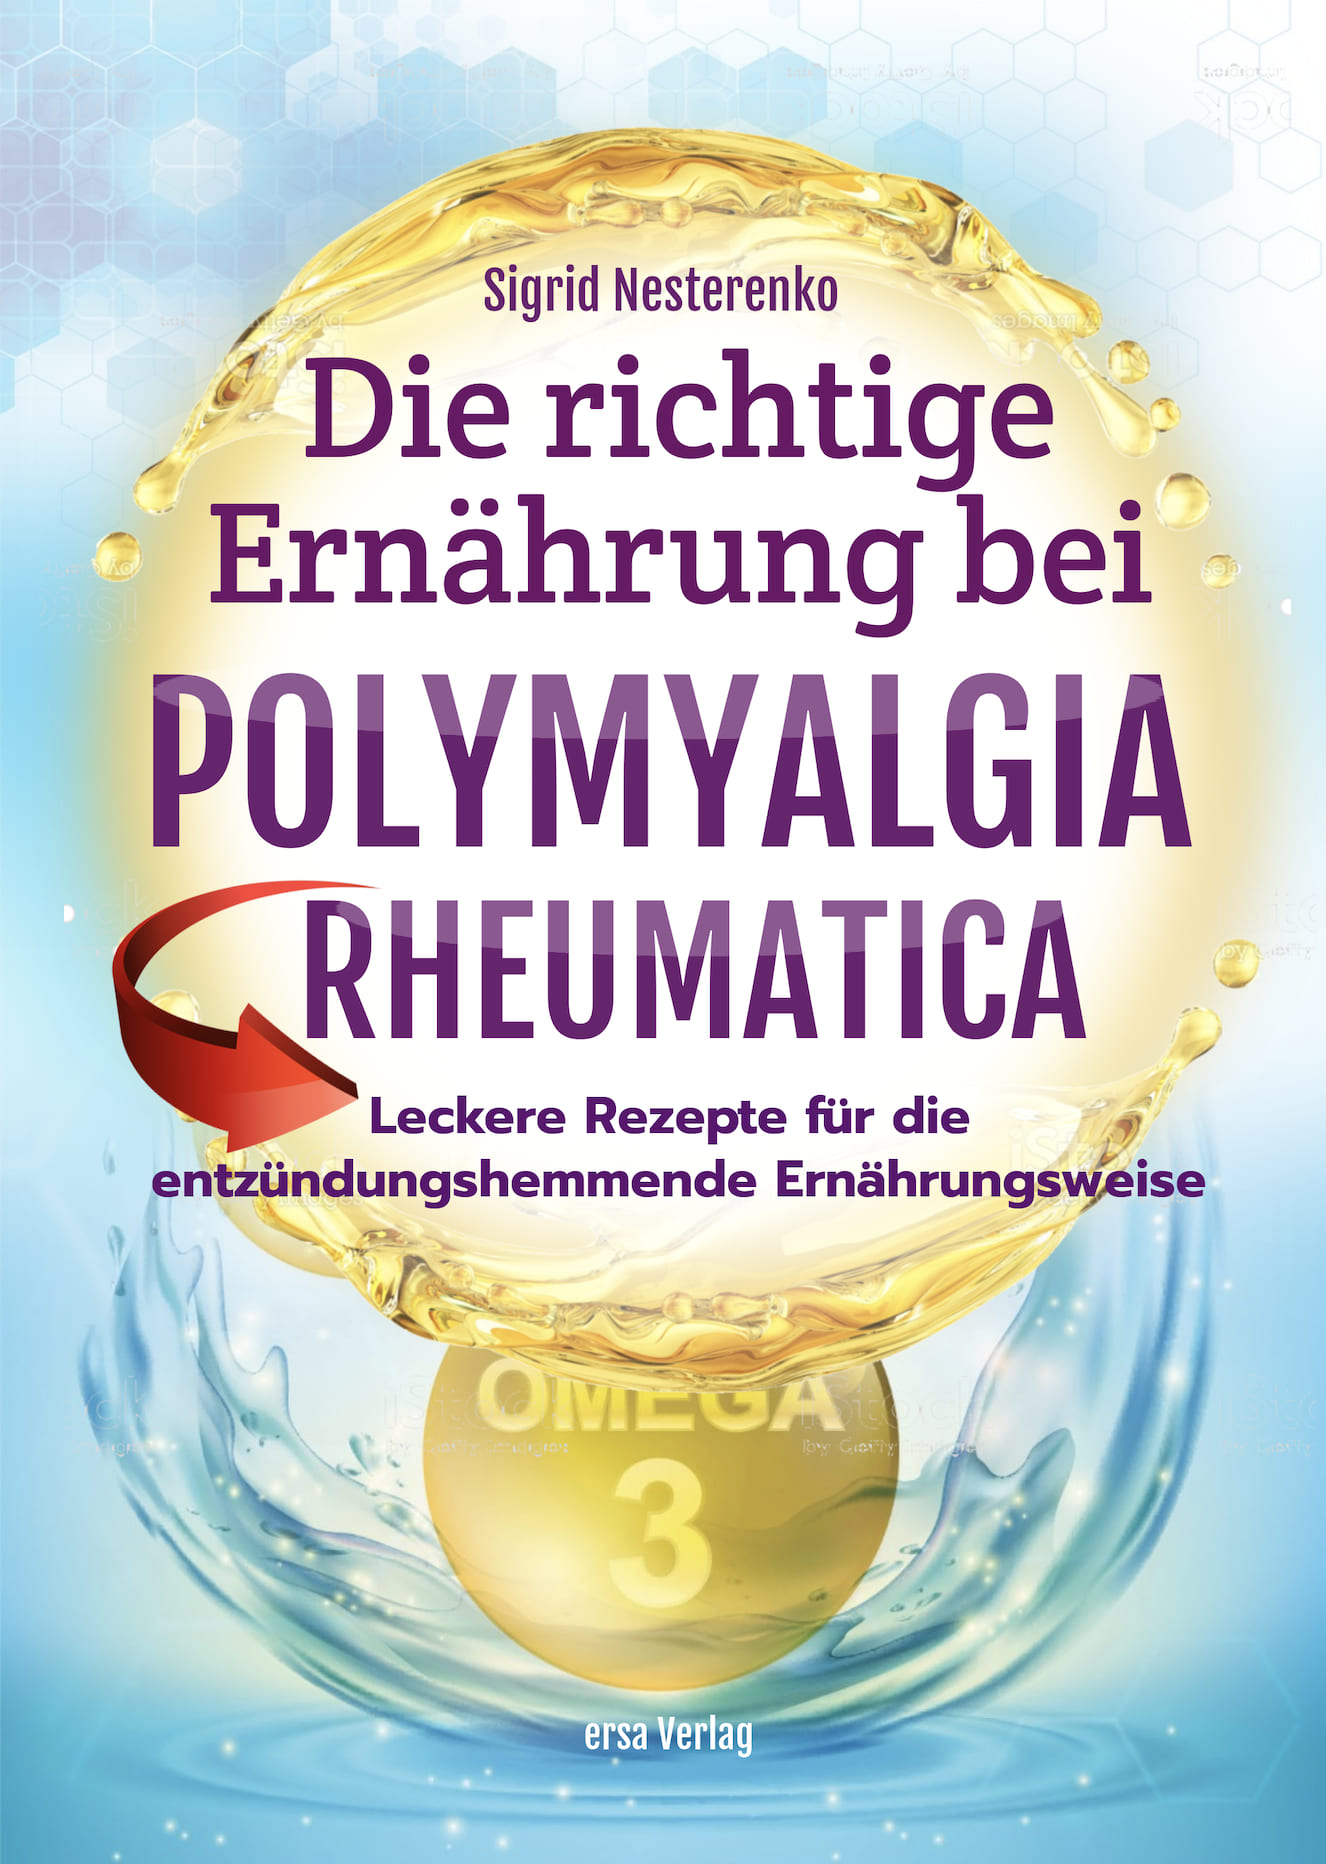 Ernährung bei Polymyalgia